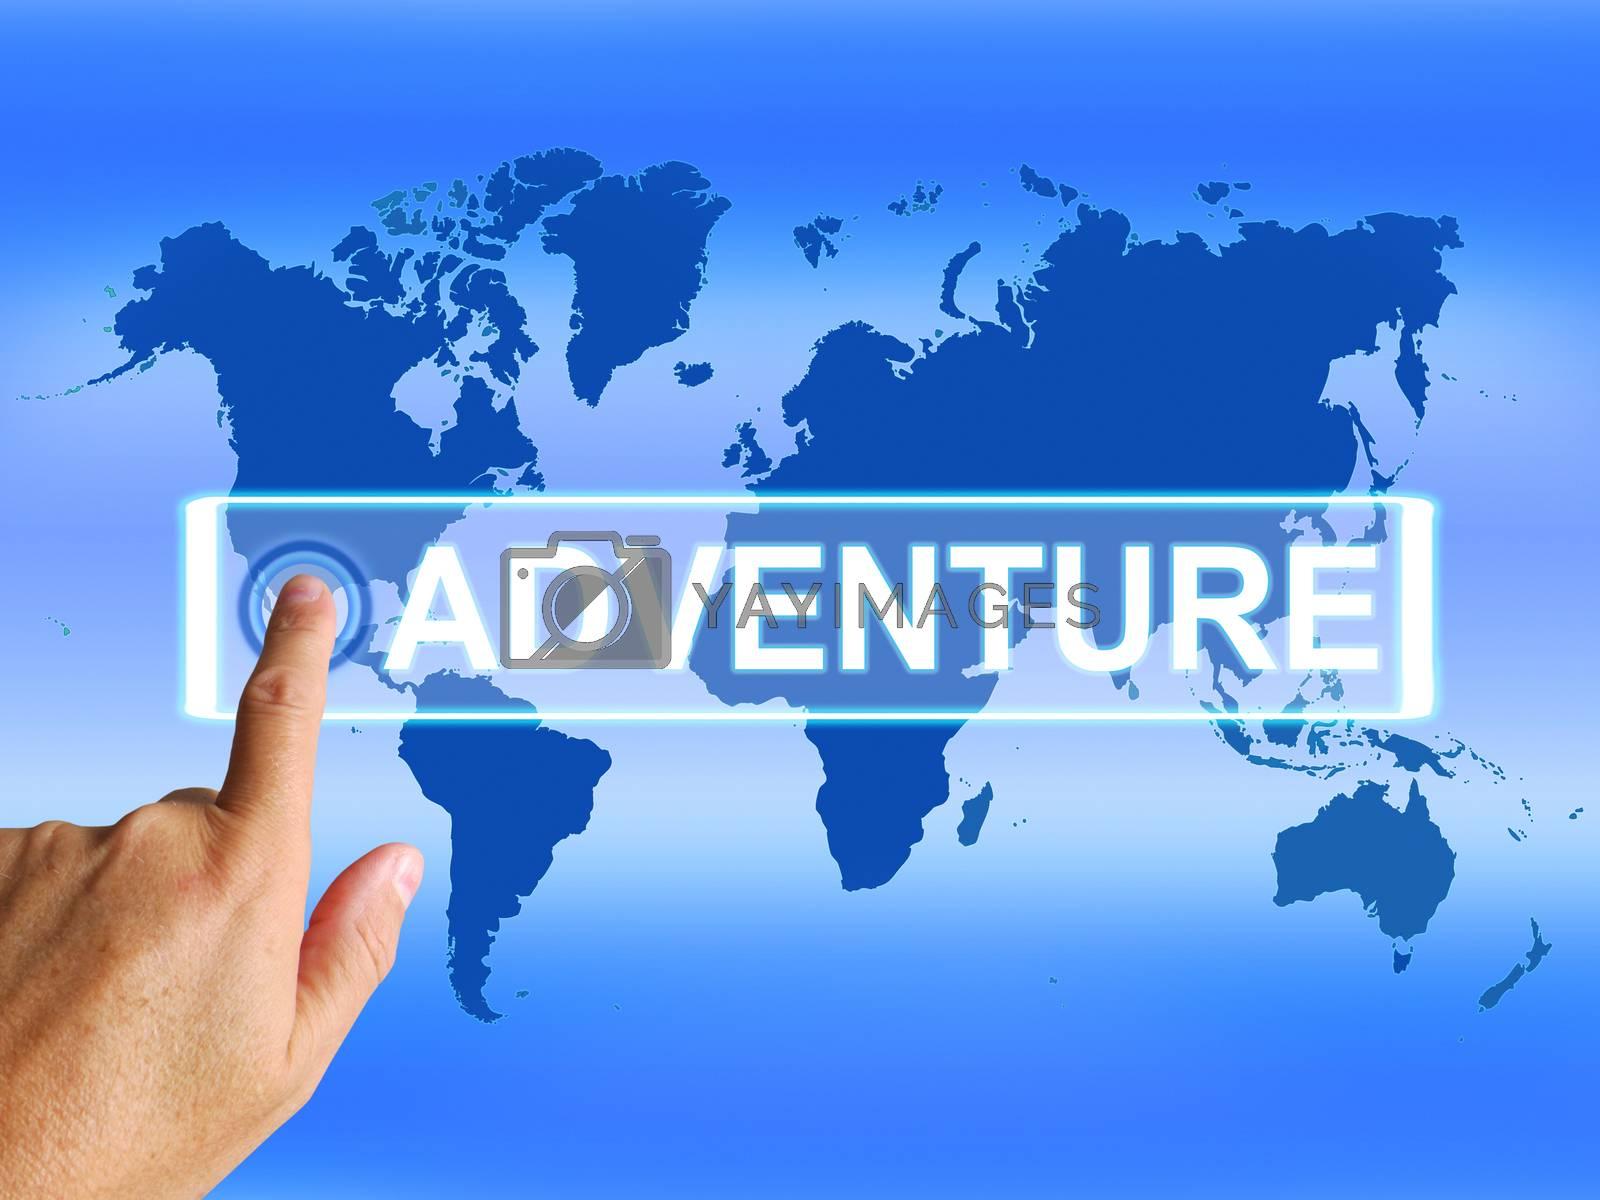 Adventure Map Represents International or Worldwide Adventure an by stuartmiles